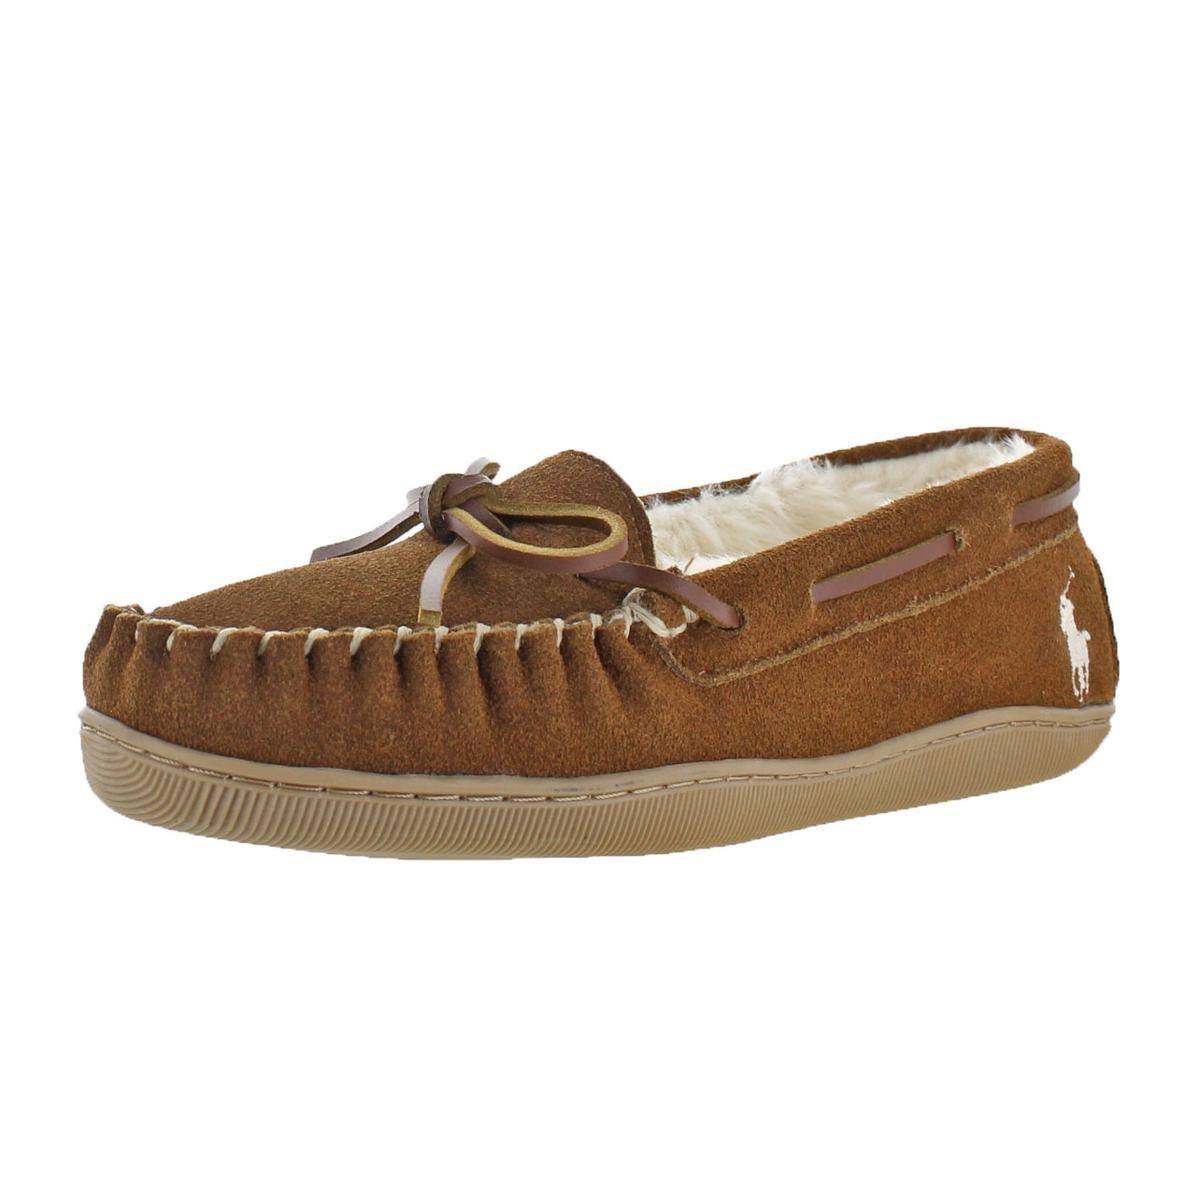 Polo Ralph Lauren Charlie Women's Suede Vegan Fur Lined Moccasin Slippers Shoes B07F21MMJR 7 M US Tan